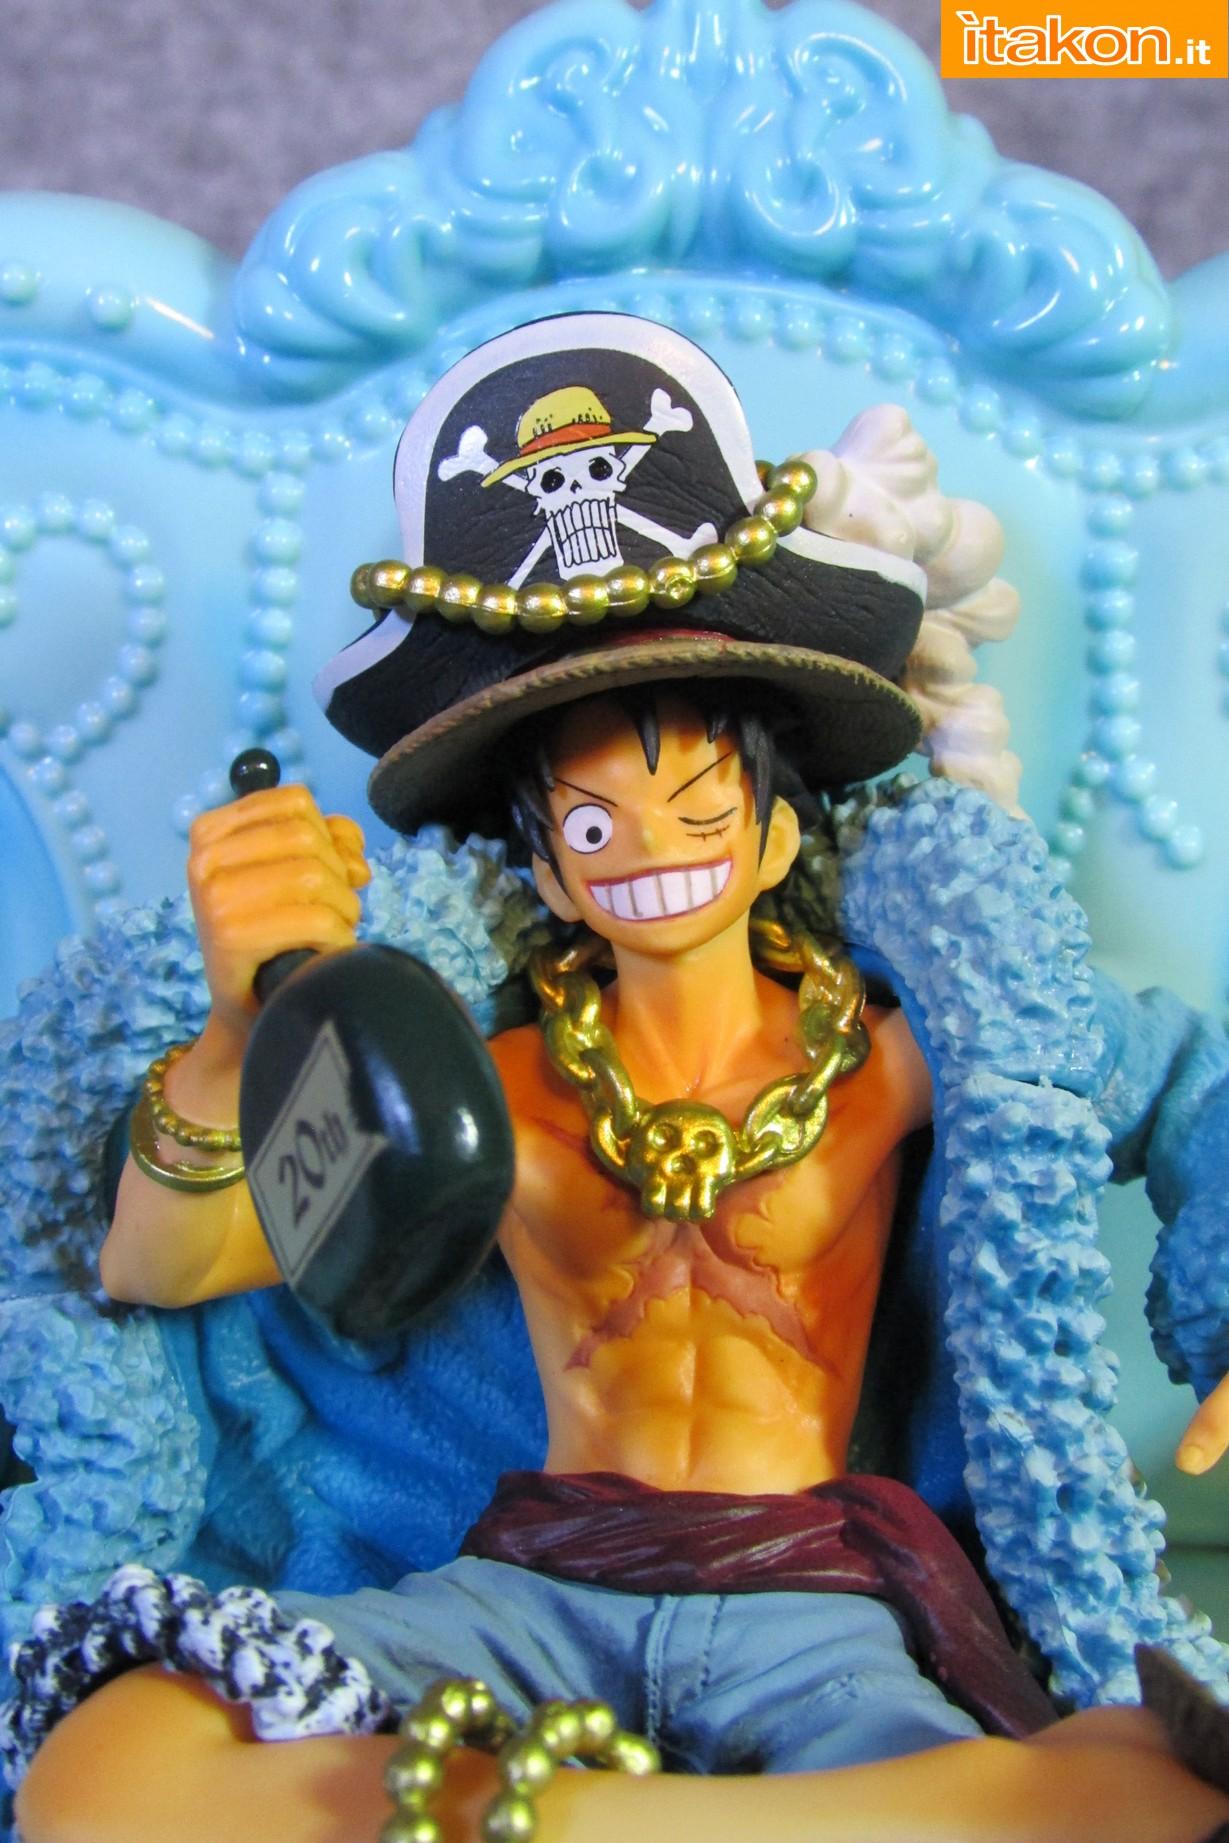 Link a Recensione Review Monkey D. Luffy One Piece 20th Anniversary ver. Figuarts ZERO di Bandai 12